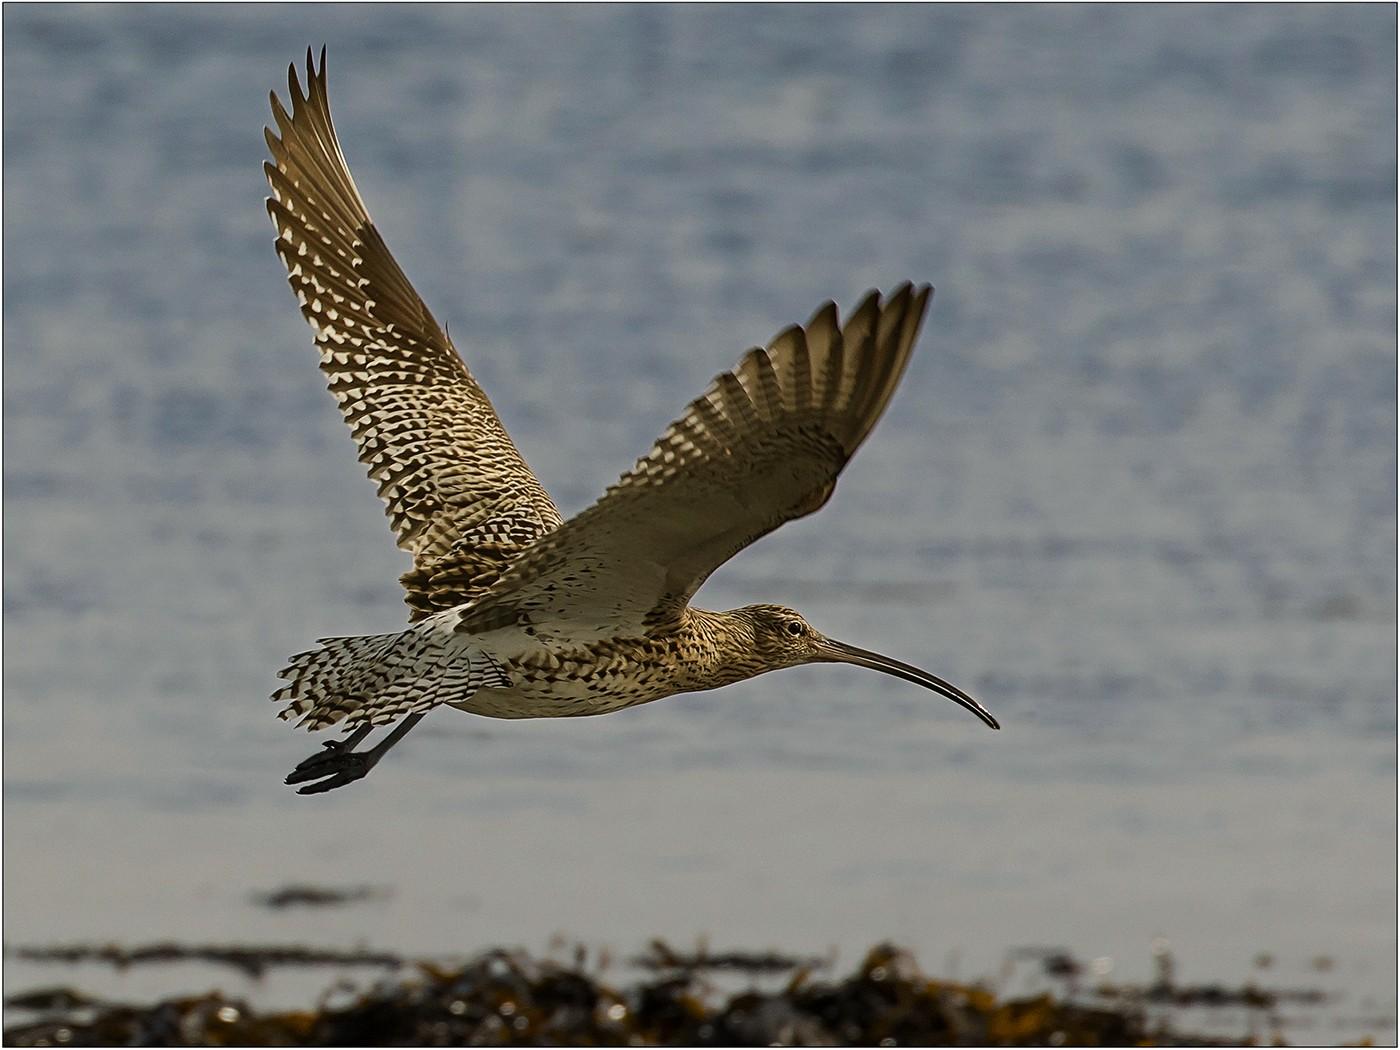 Curlew on Seashore